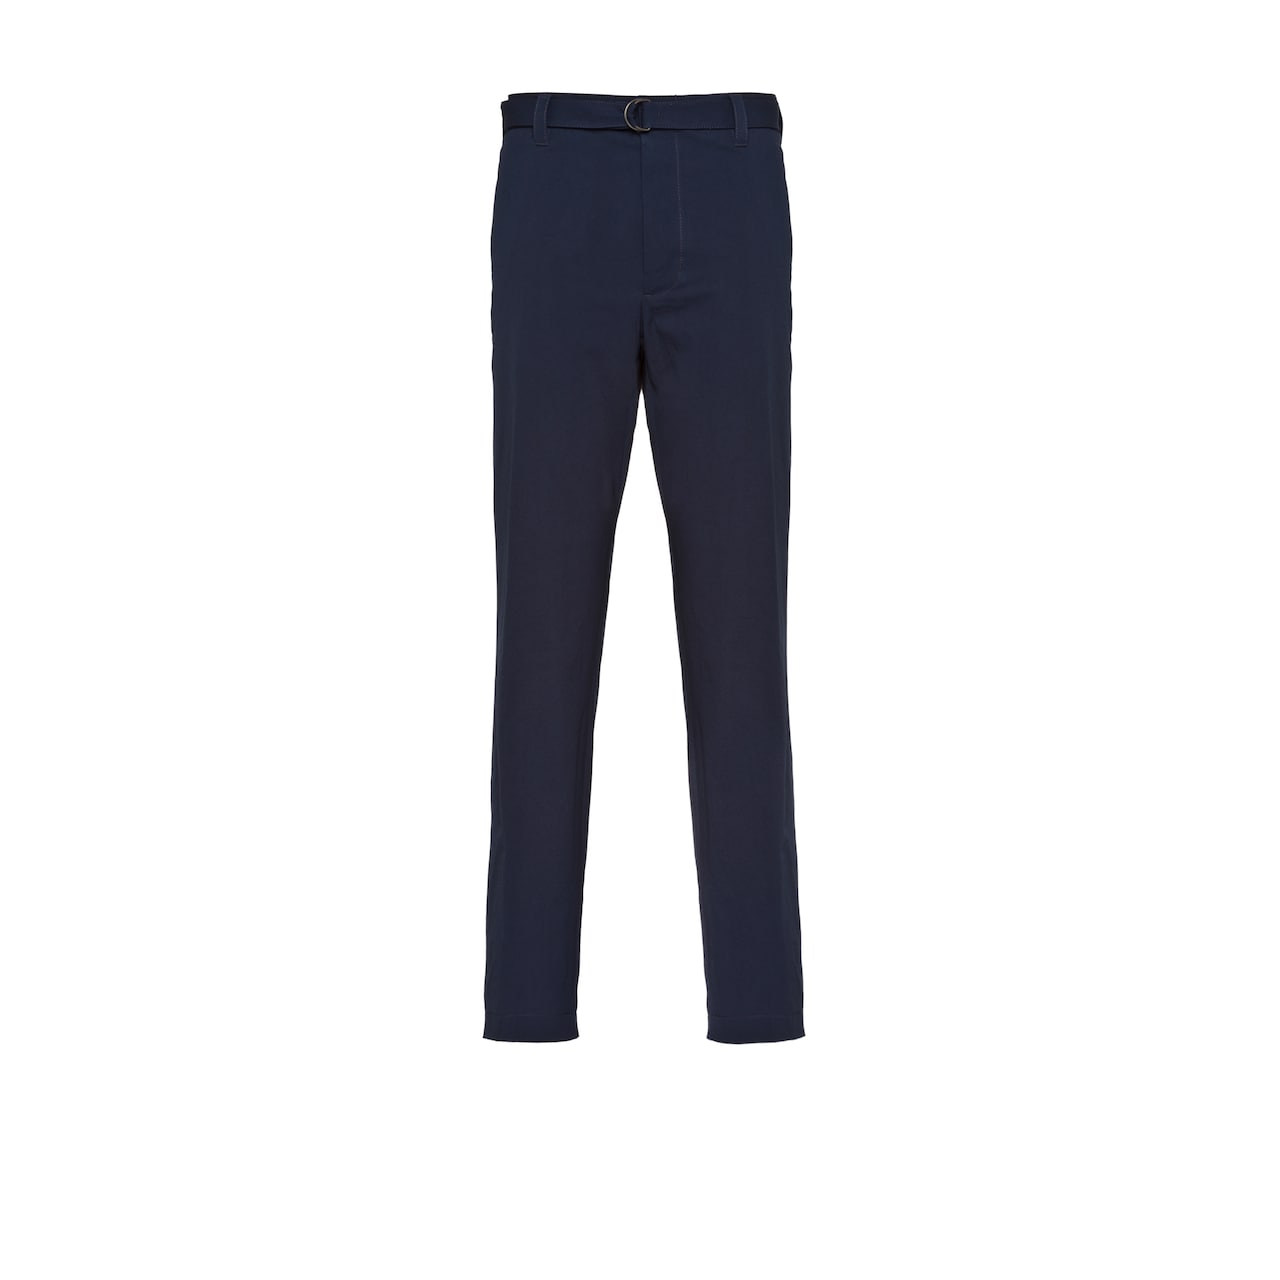 Washed cotton gabardine trousers